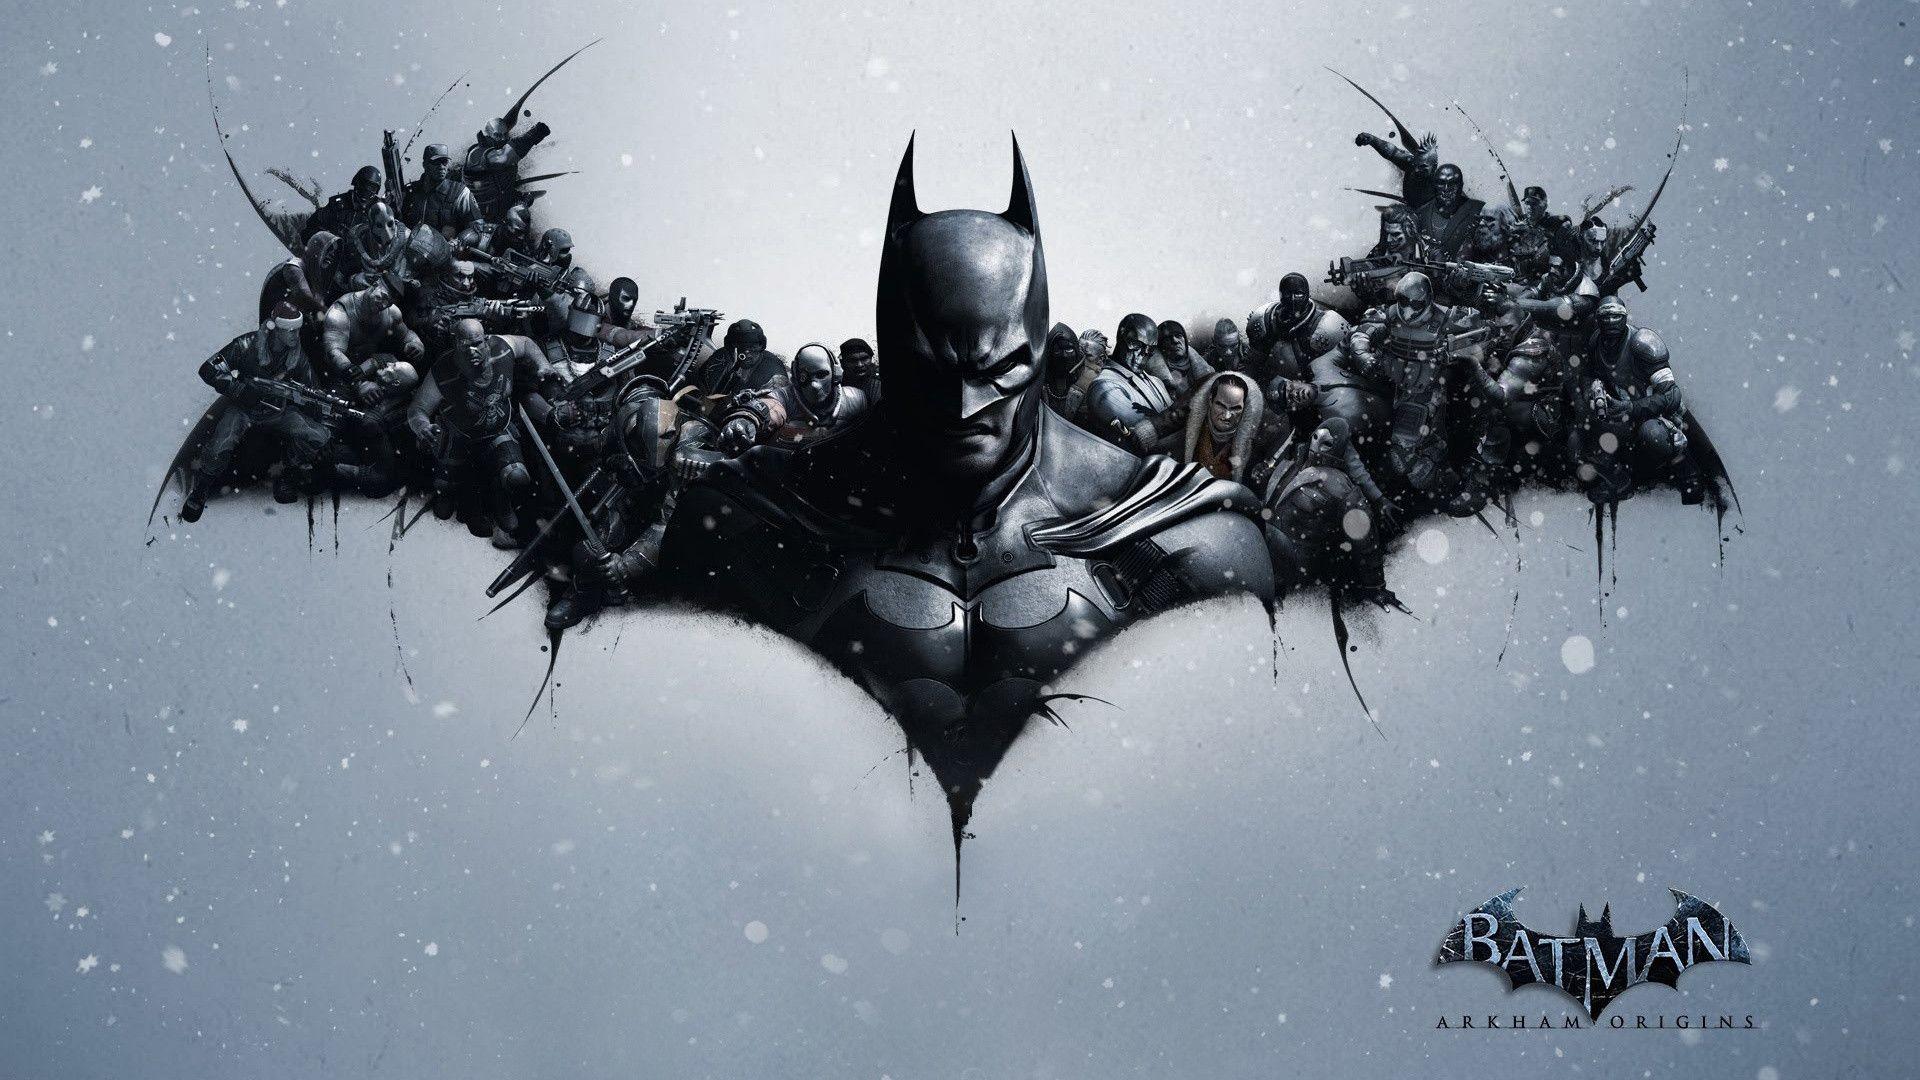 Batman Arkham Origins Video Game Wallpapers.